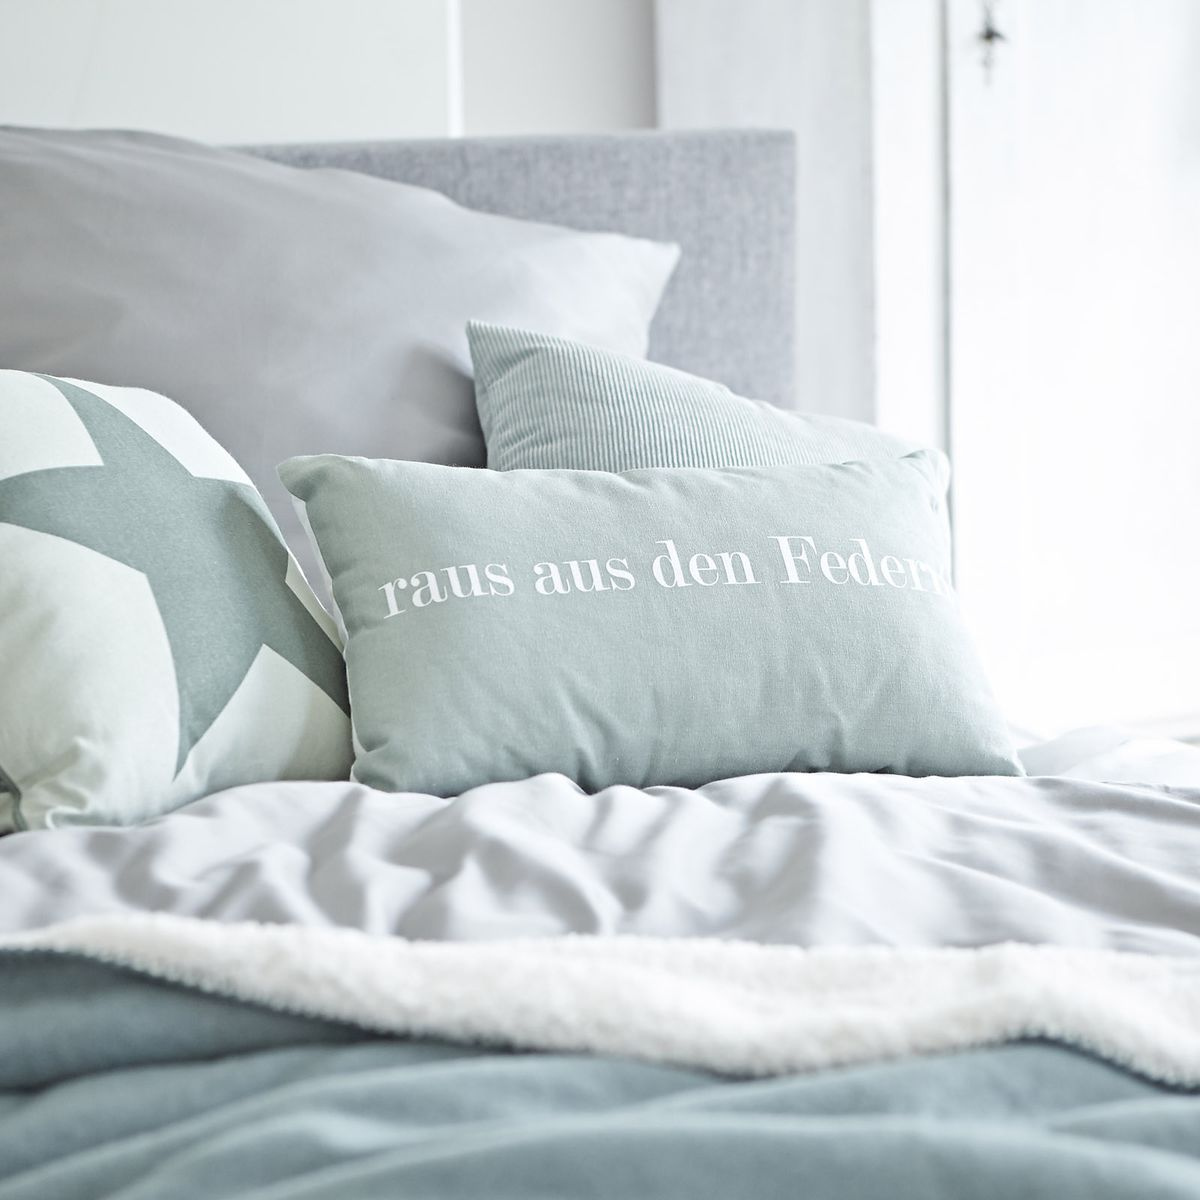 Kissen Ab Ins Bett B 30cm X L 50cm Grau Grun Grau Grun Wohnen